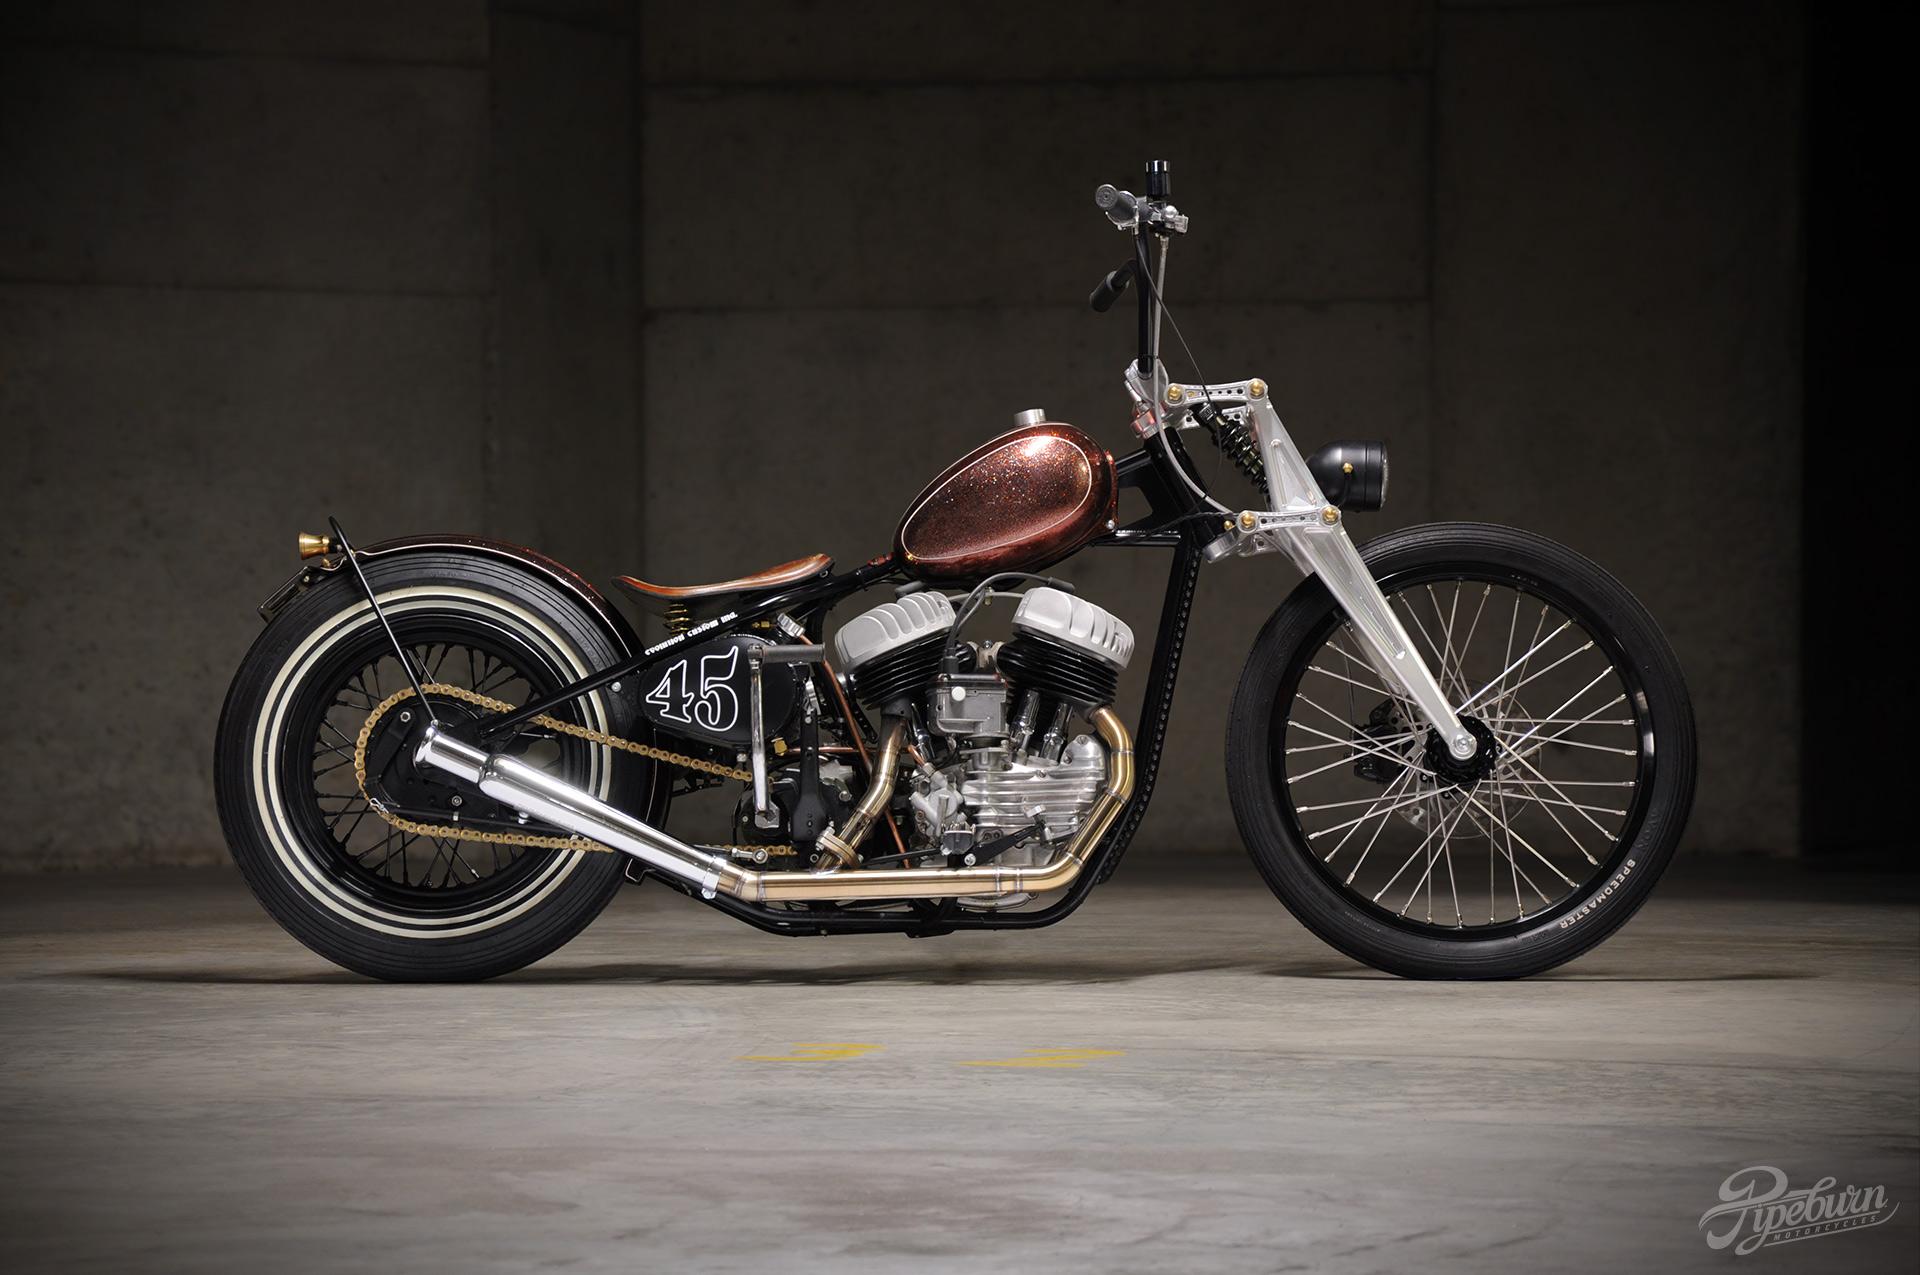 Harley Davidson Classic Wallpaper Harley Davidson Wallpaper High 1920x1275